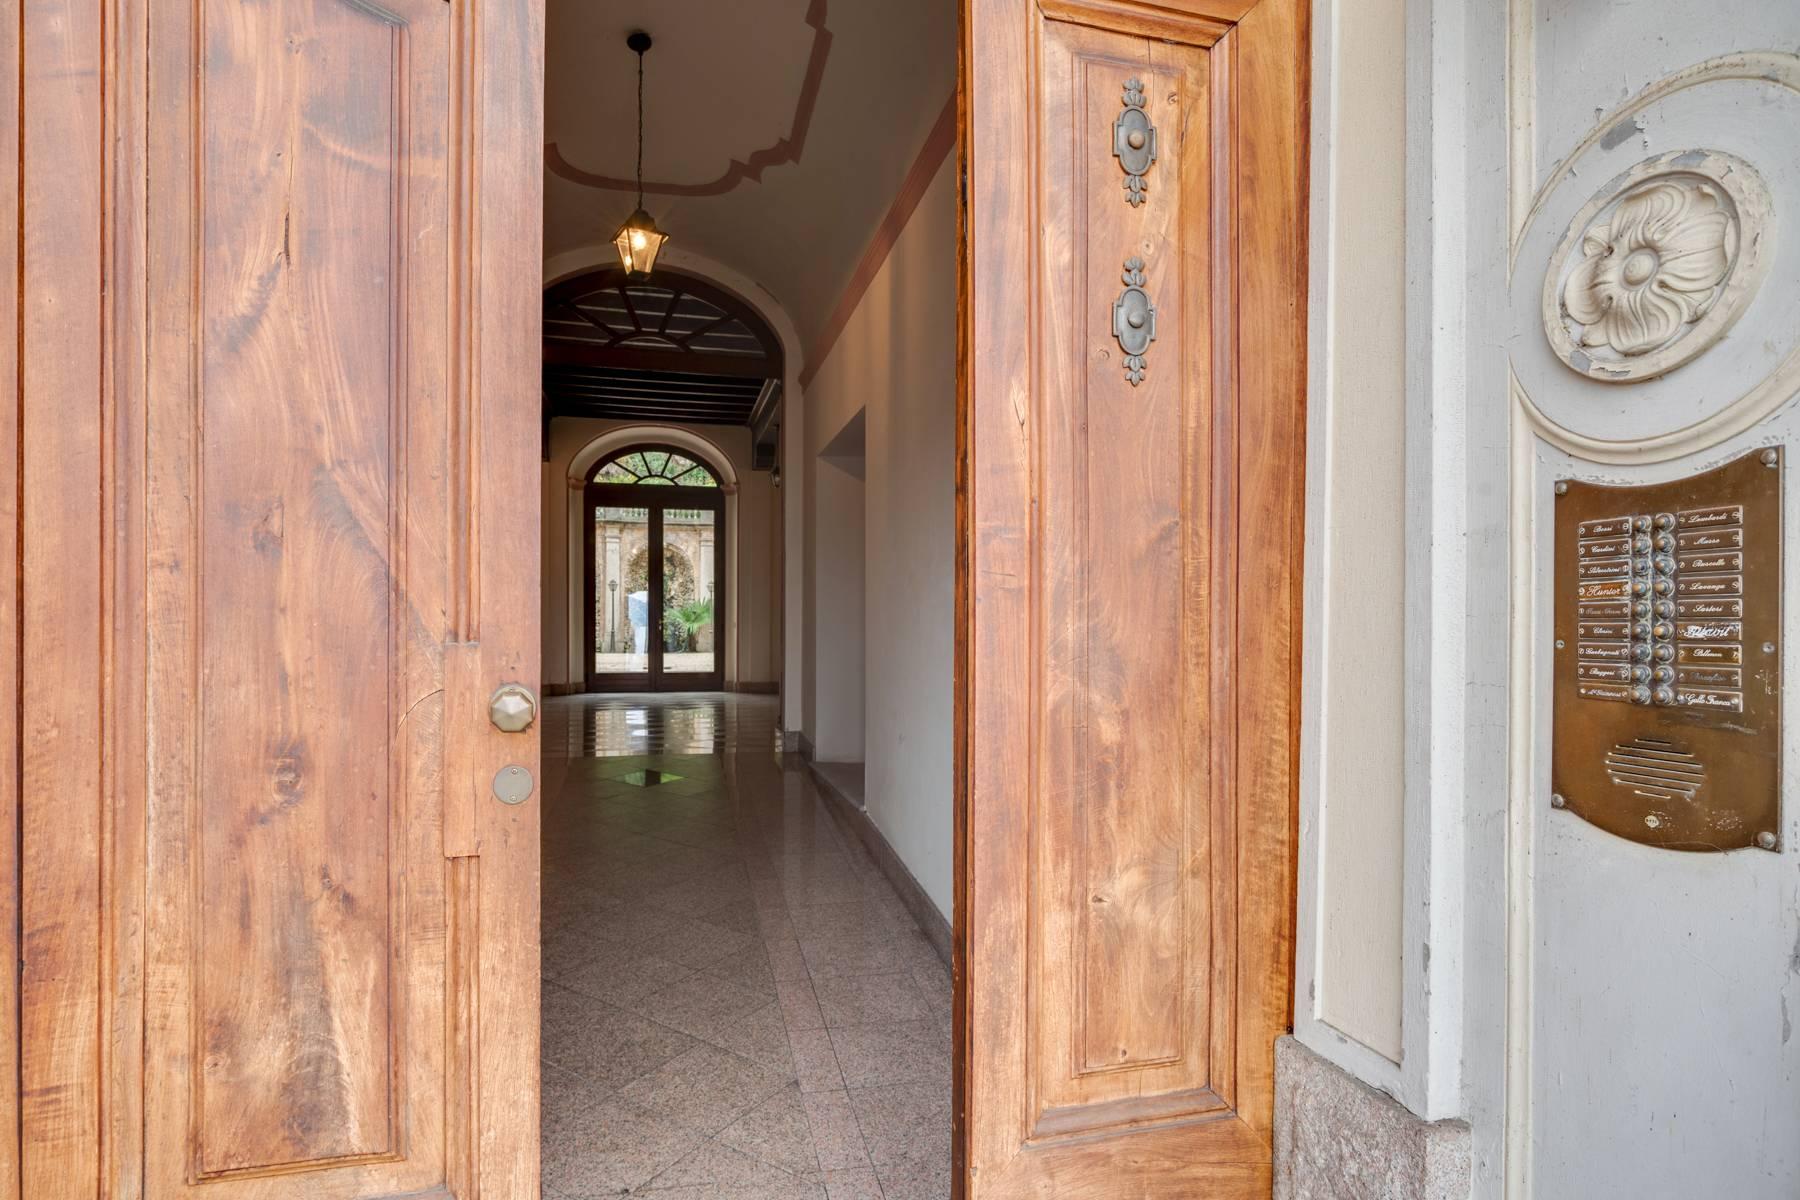 Appartamento in Vendita a Belgirate: 4 locali, 118 mq - Foto 6